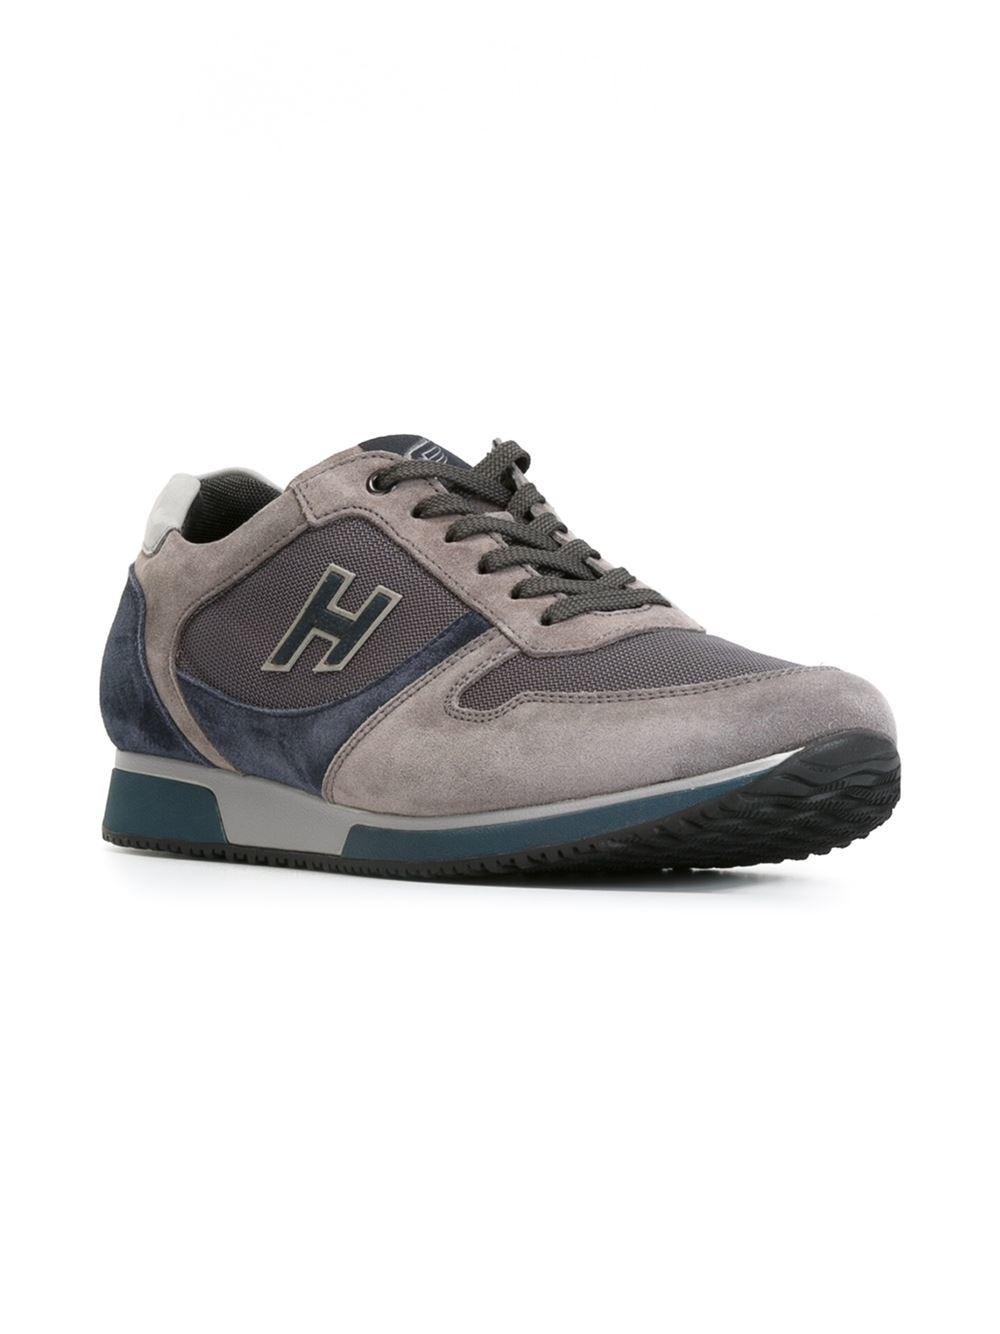 Hogan 'h198' Sneakers in Grey (Gray) for Men - Lyst